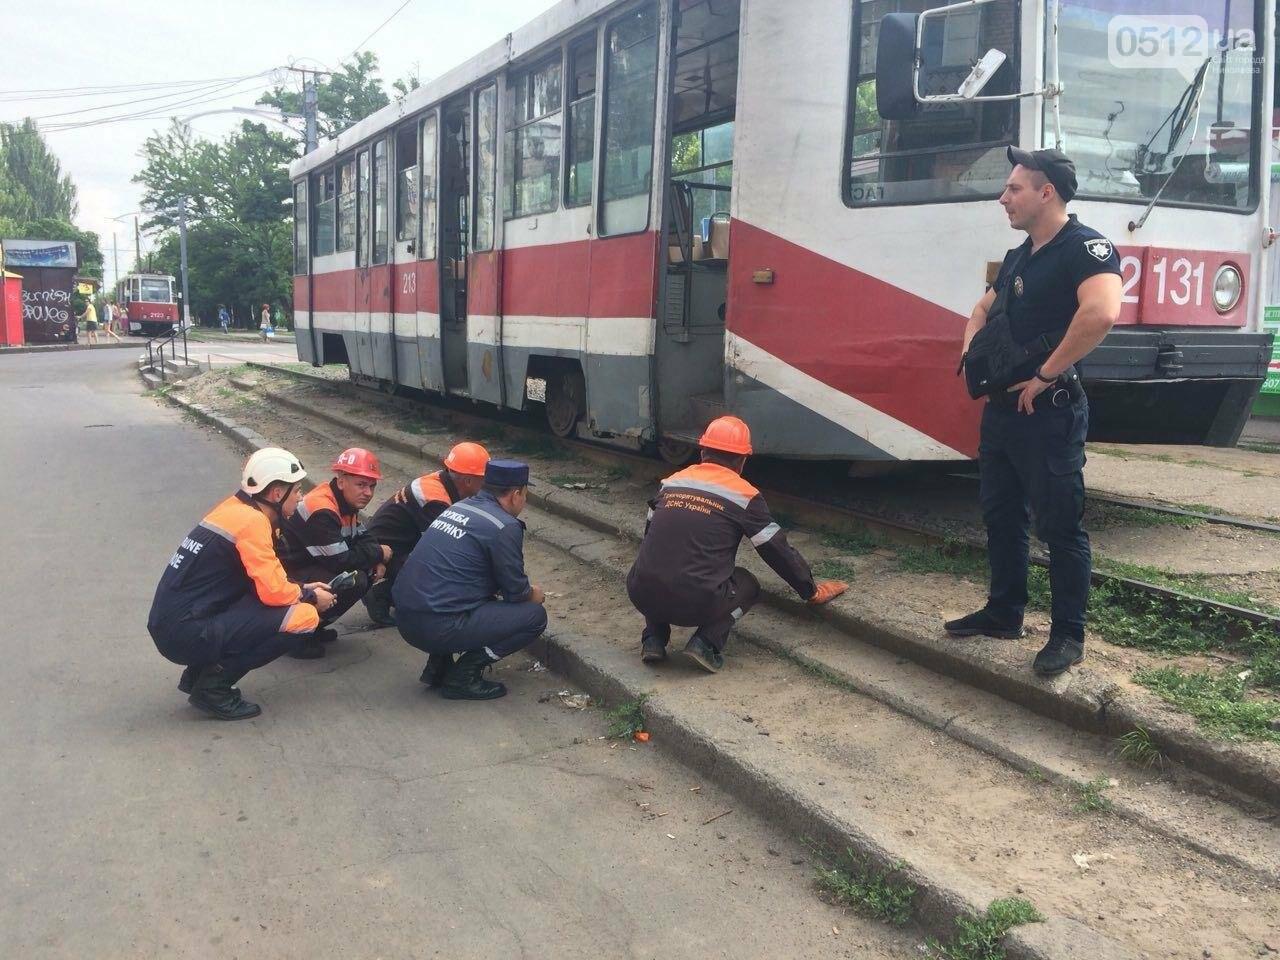 В Николаеве трамвай переехал мужчину, - ФОТО, ВИДЕО 18+, фото-1